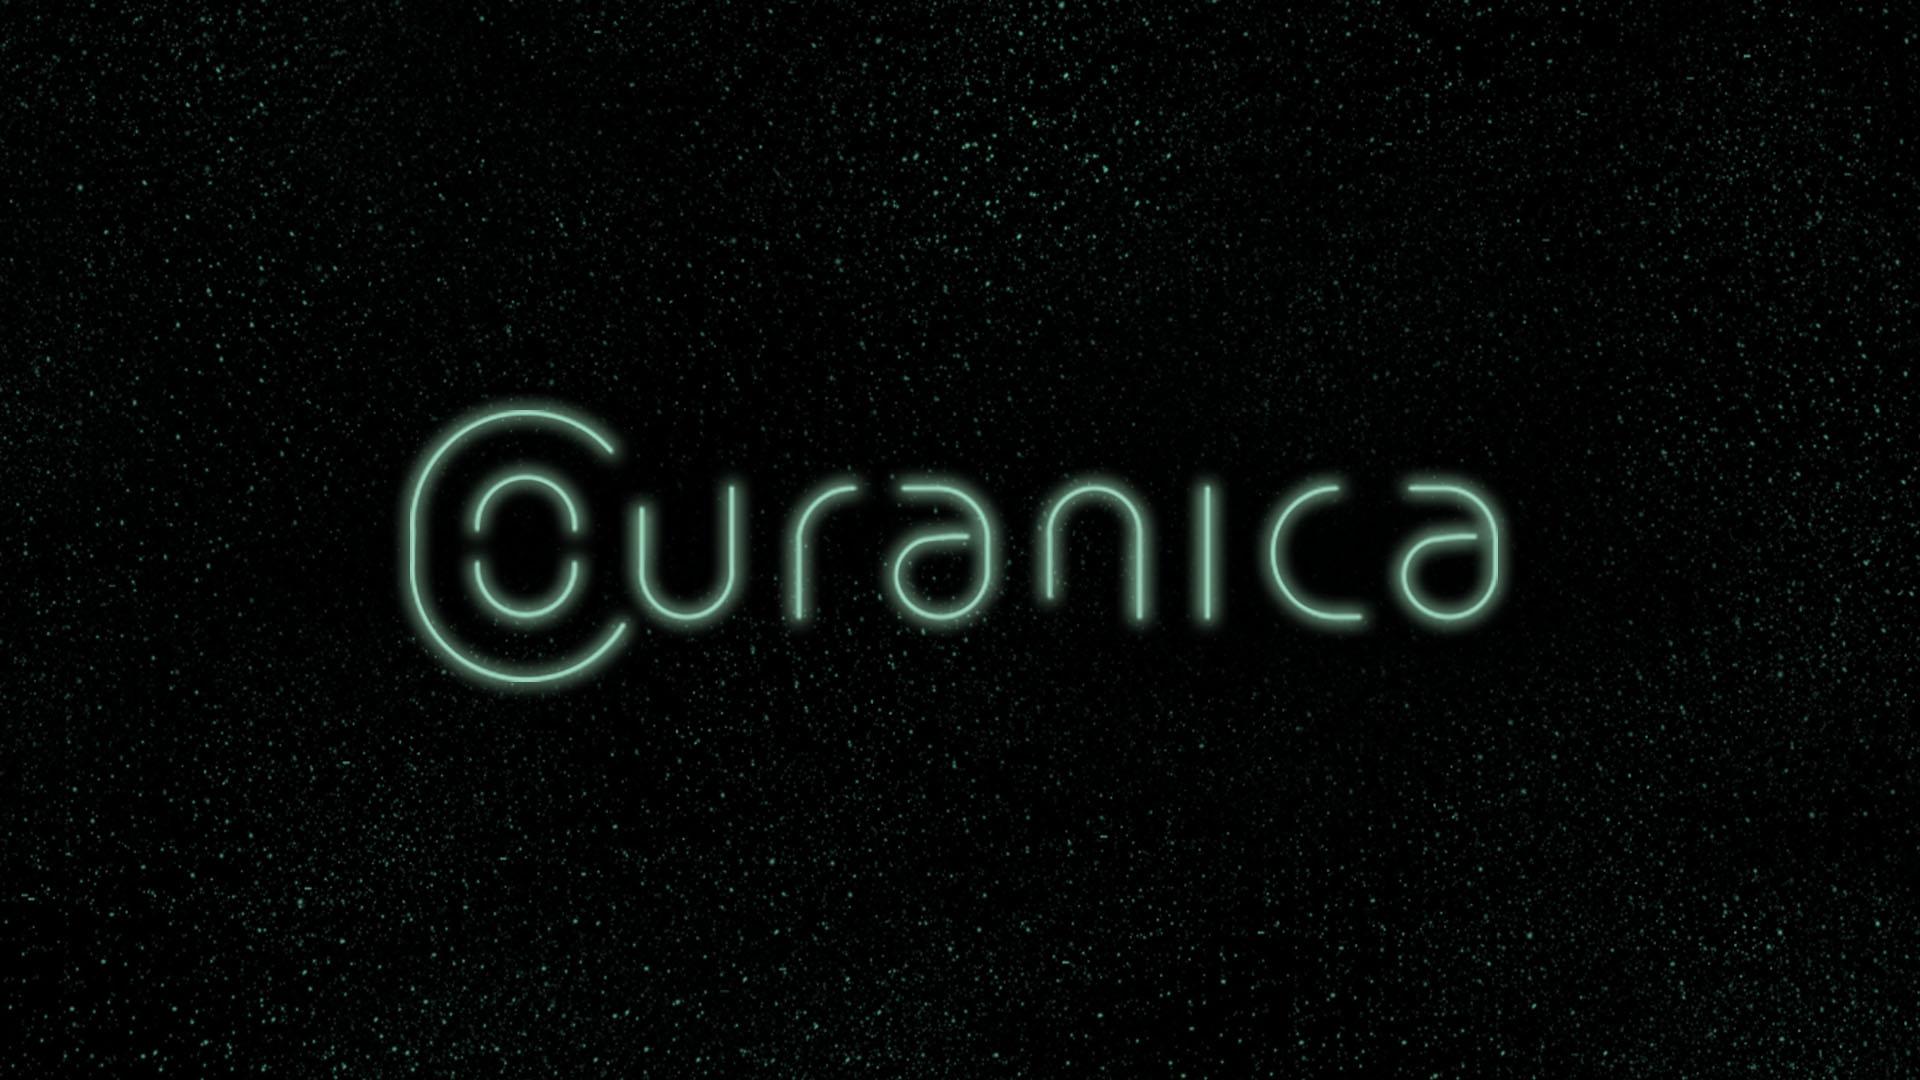 Ouranica